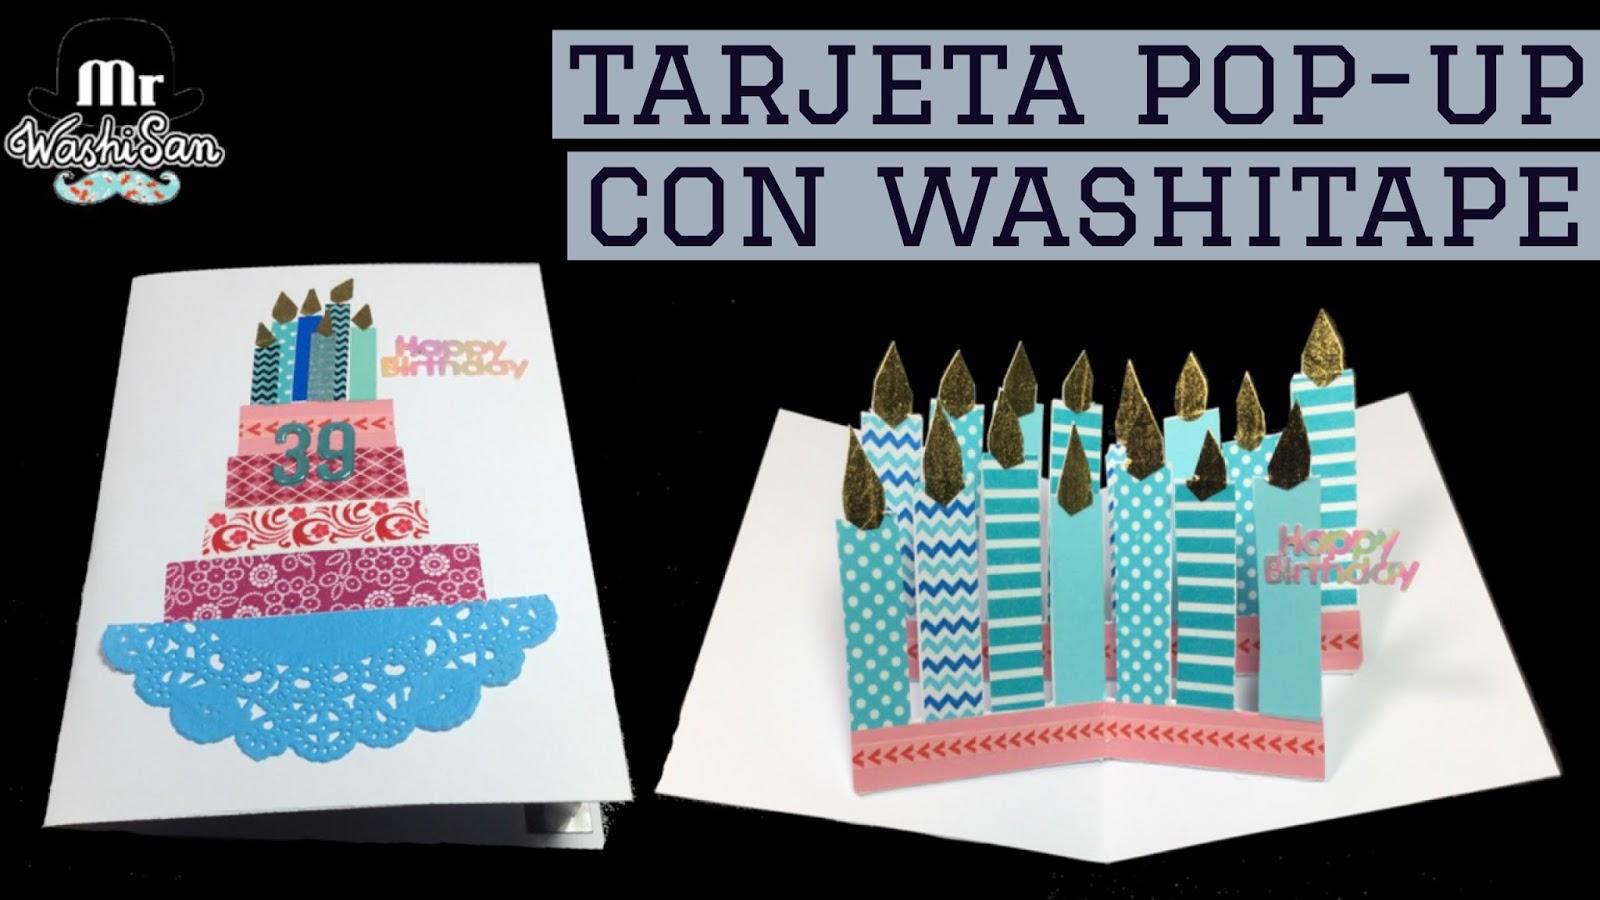 Mr WashiSan: Tarjeta muy fácil pop-up 3D de cumpleaños con washitape